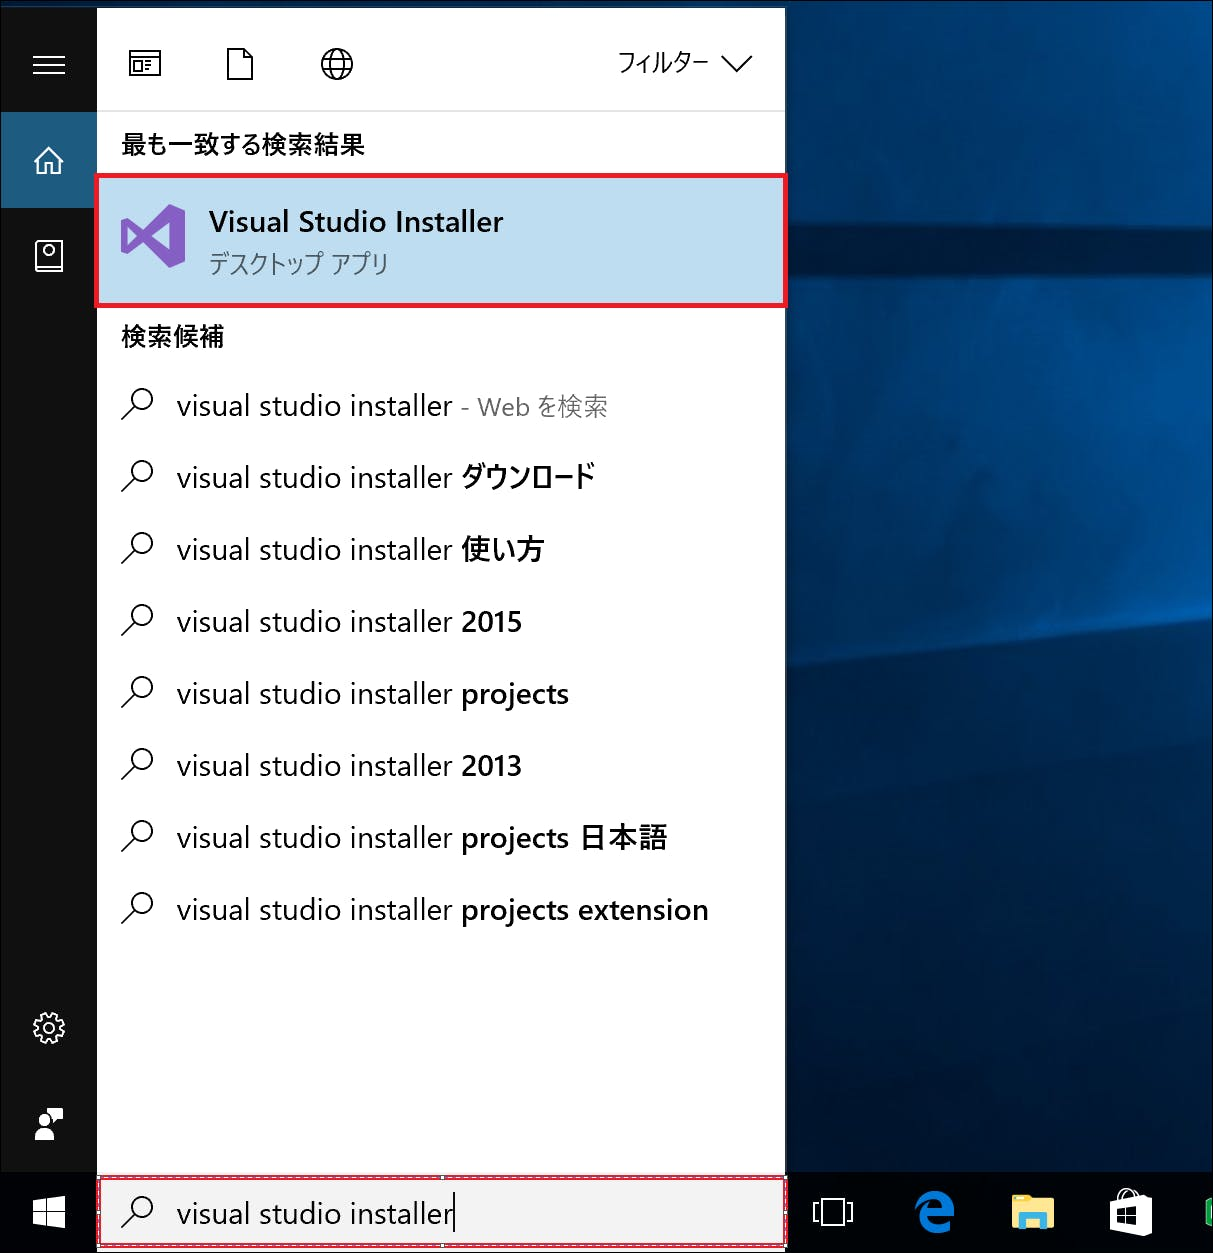 Visual Studio 2017にコンポーネント(機能)を追加する方法 - Qiita